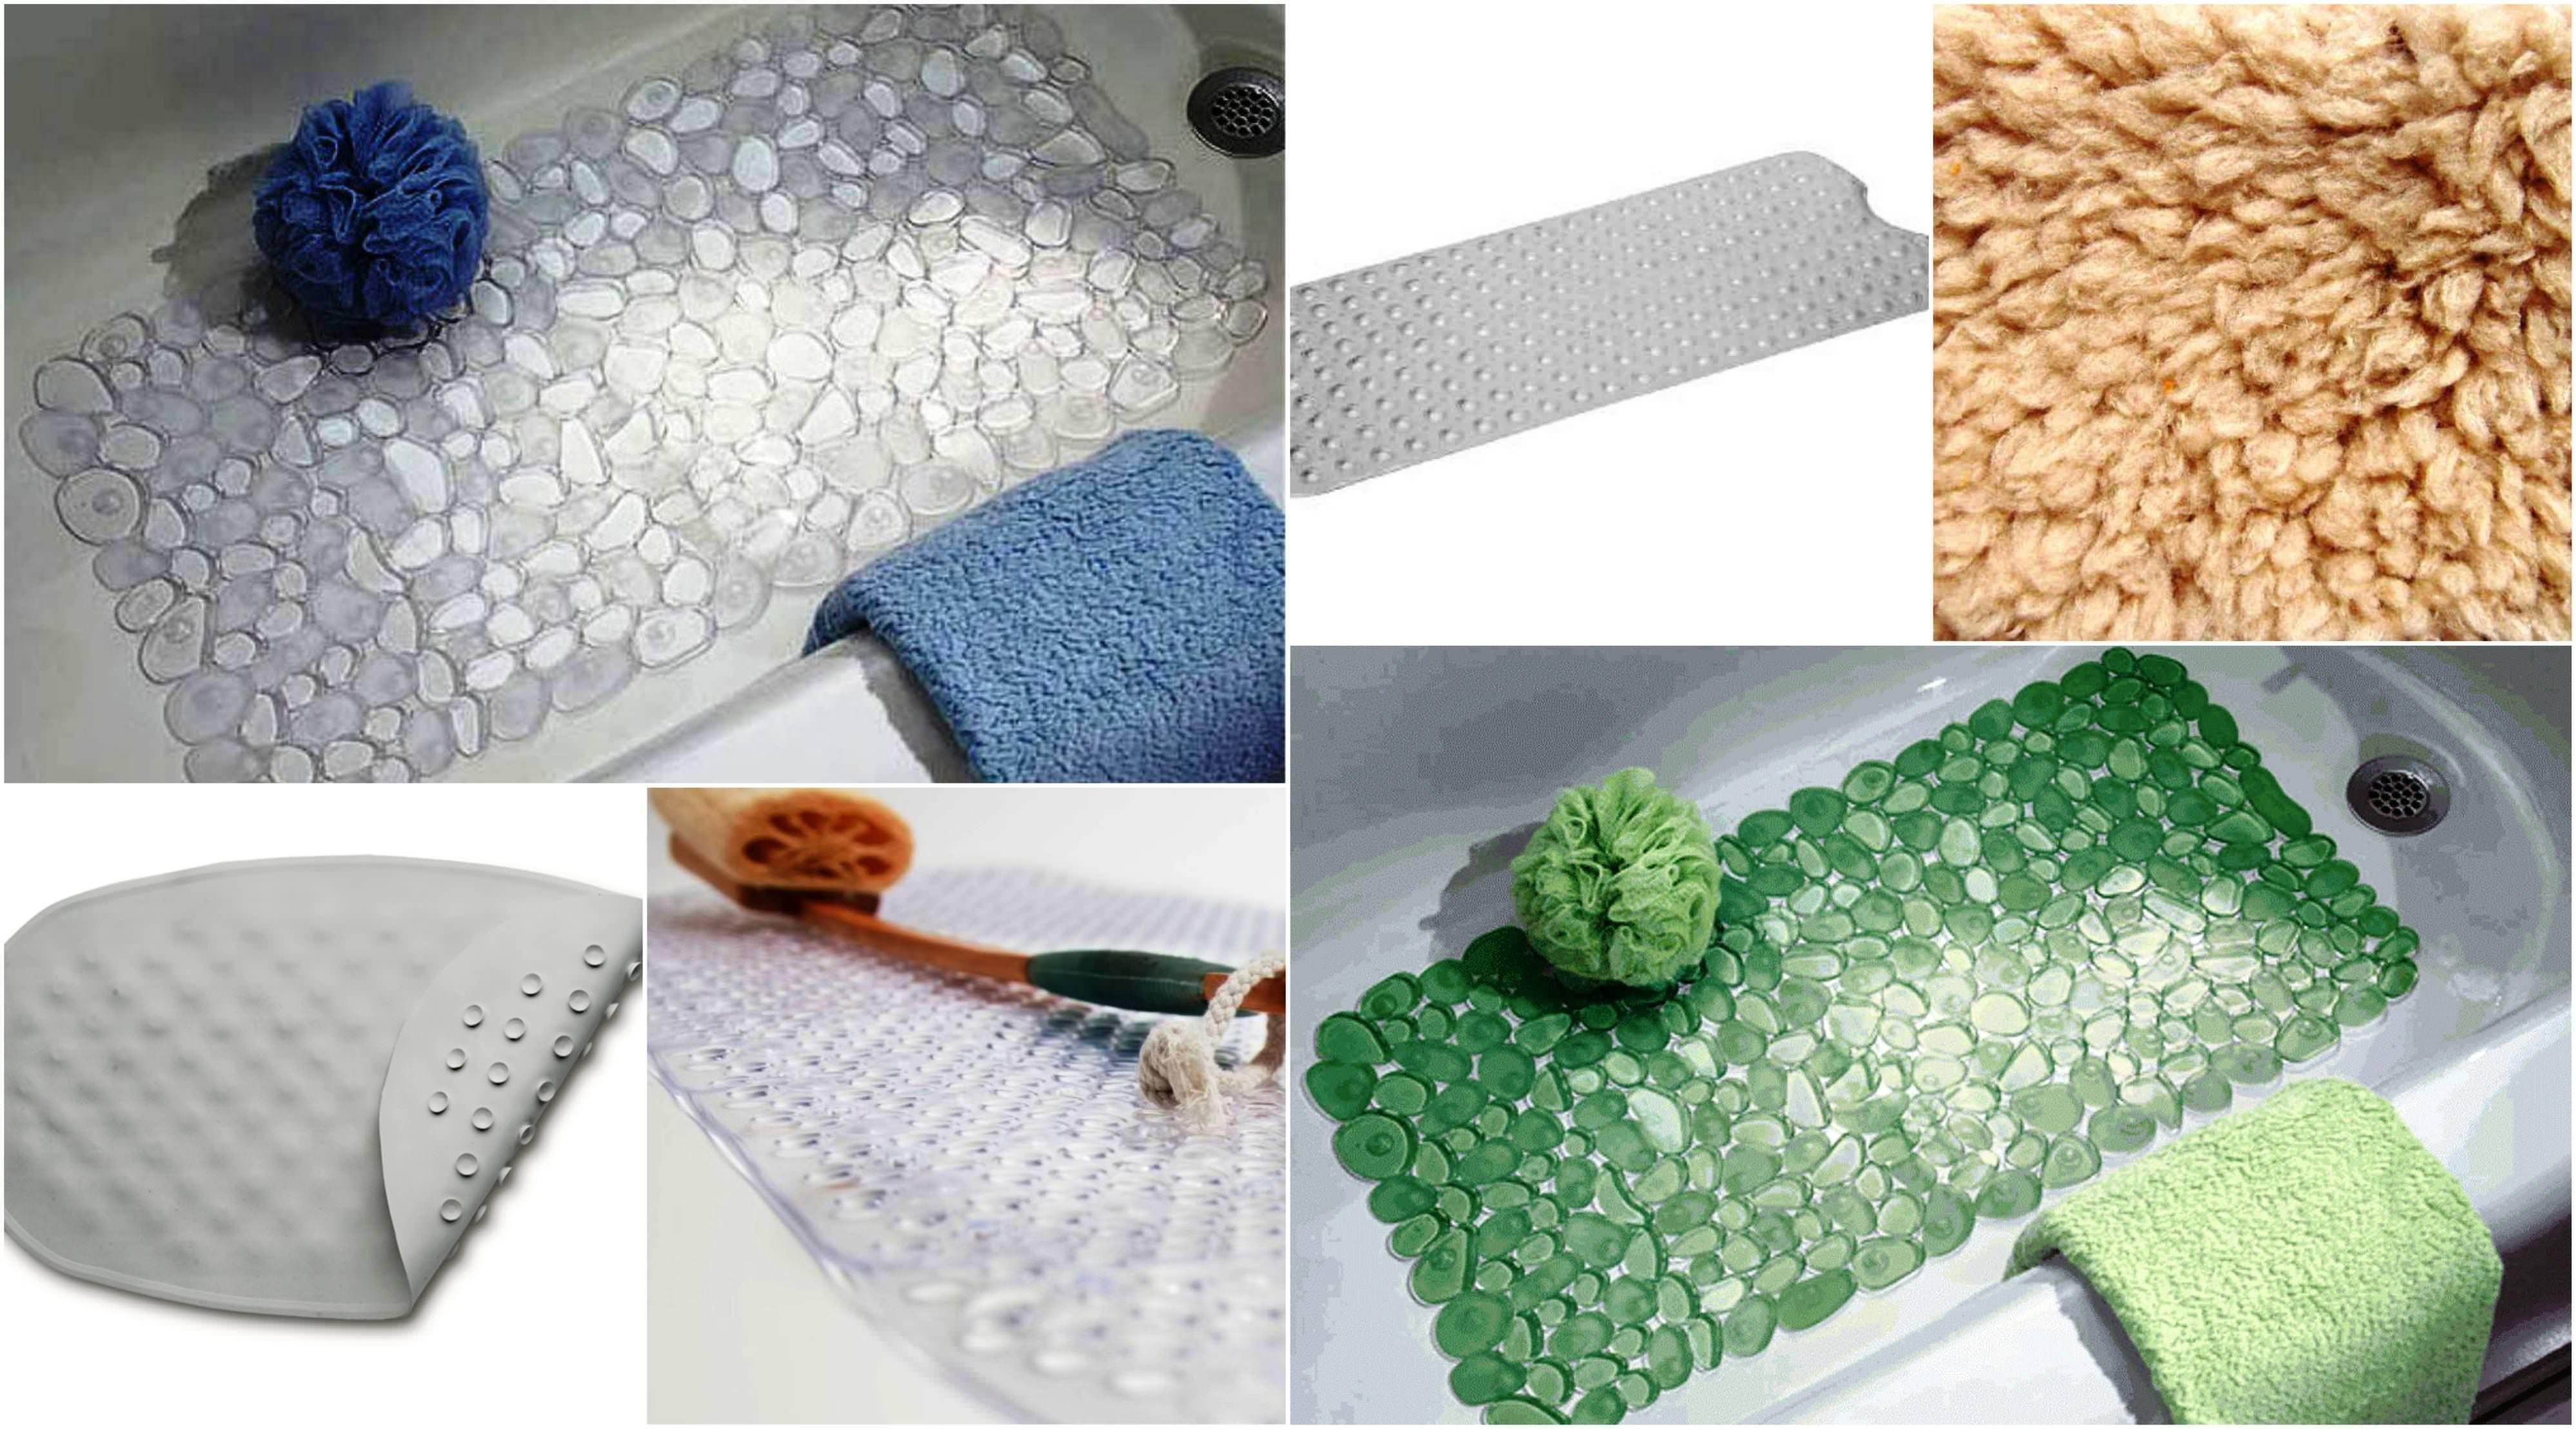 Non Slip Bath Mat For Textured Tub | Bathroom Decor | Pinterest ...